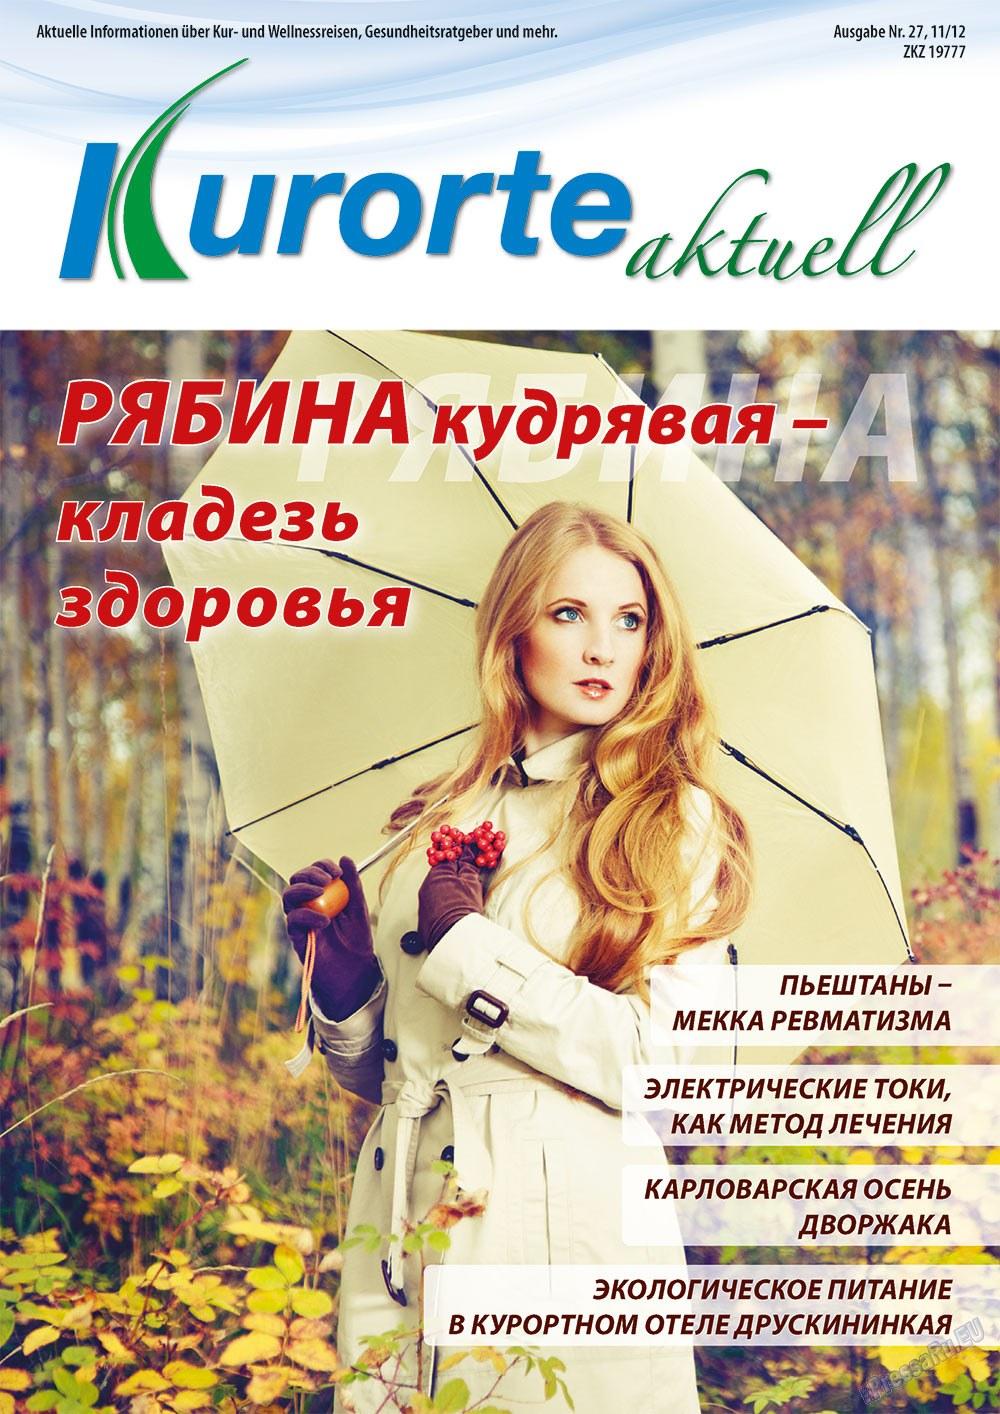 Kurorte aktuell (газета). 2012 год, номер 27, стр. 1